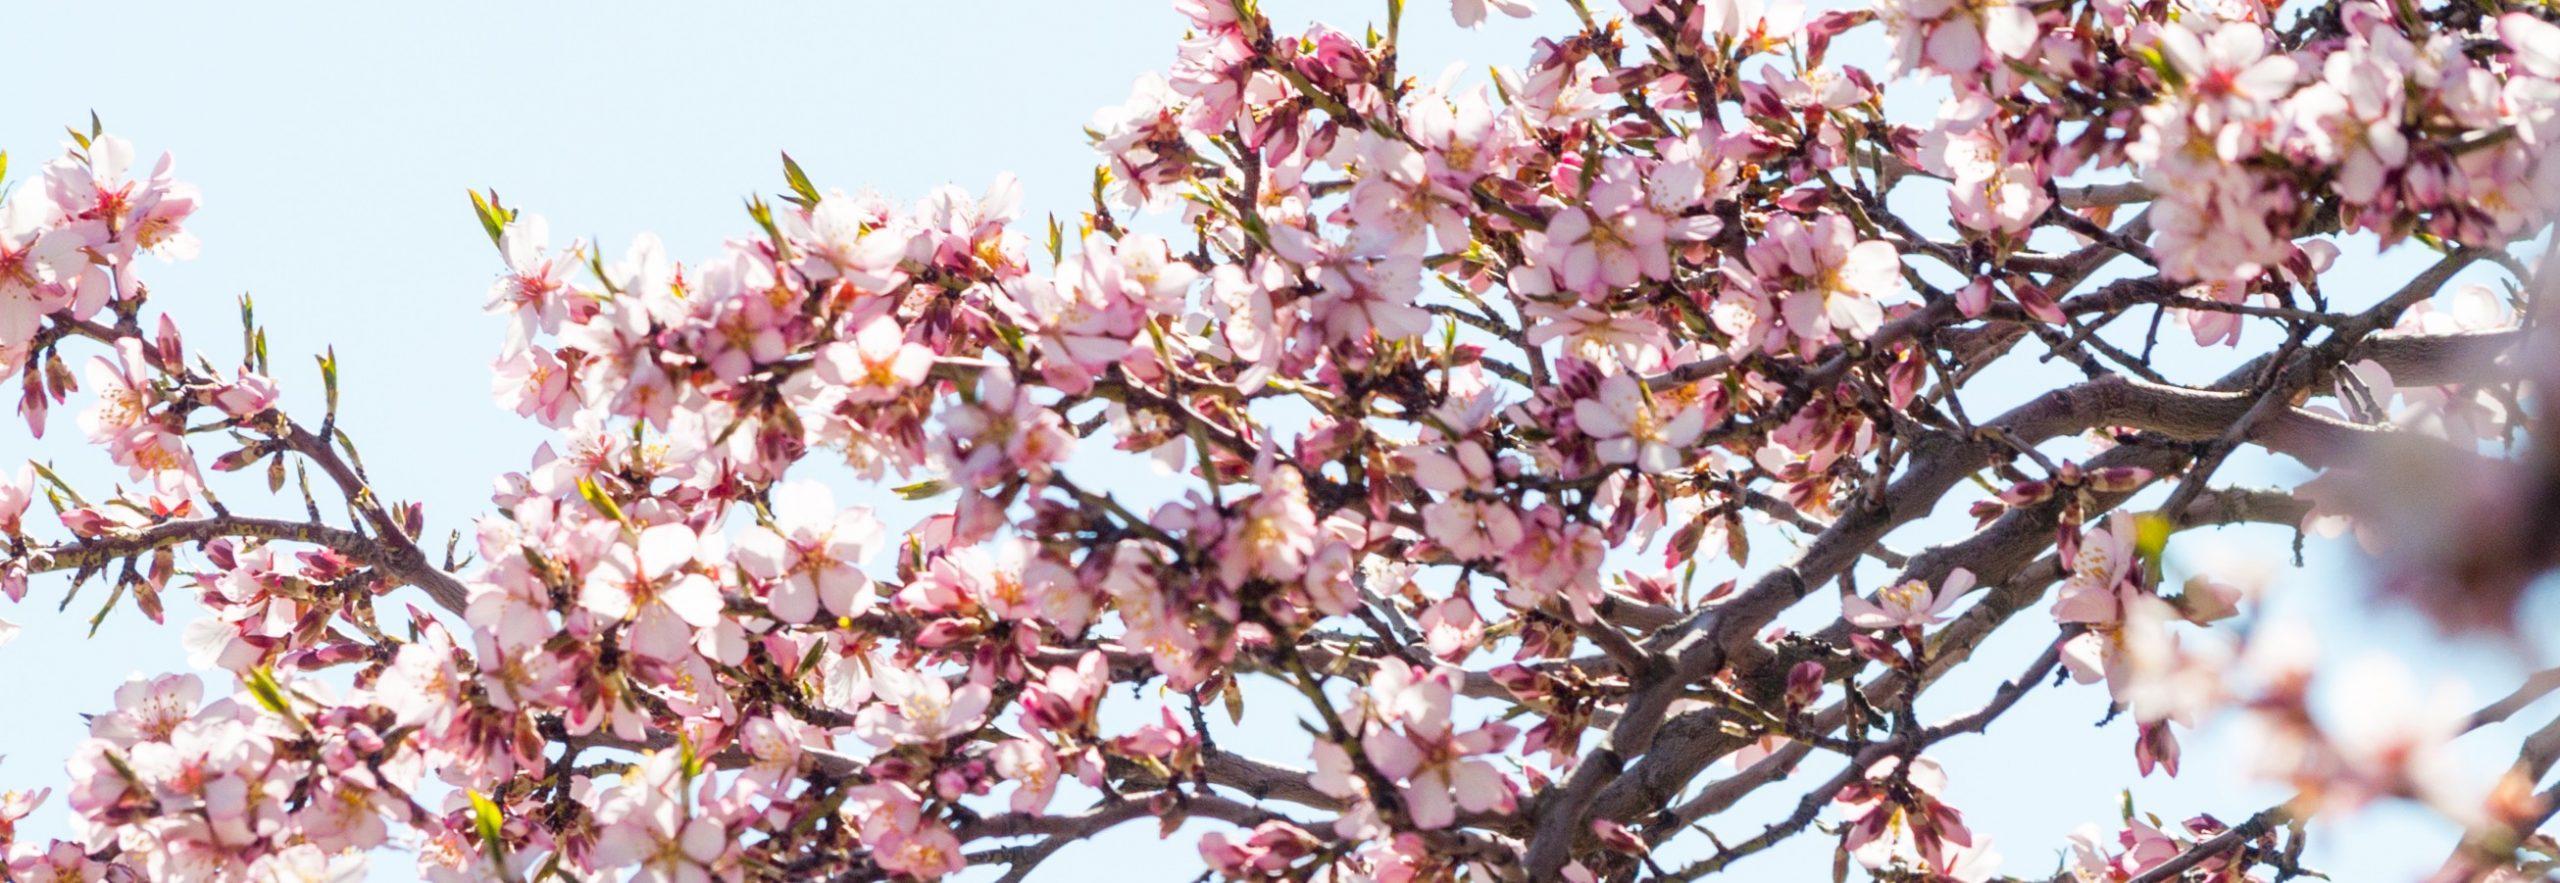 Experience the Power of Sakura with Shiseido